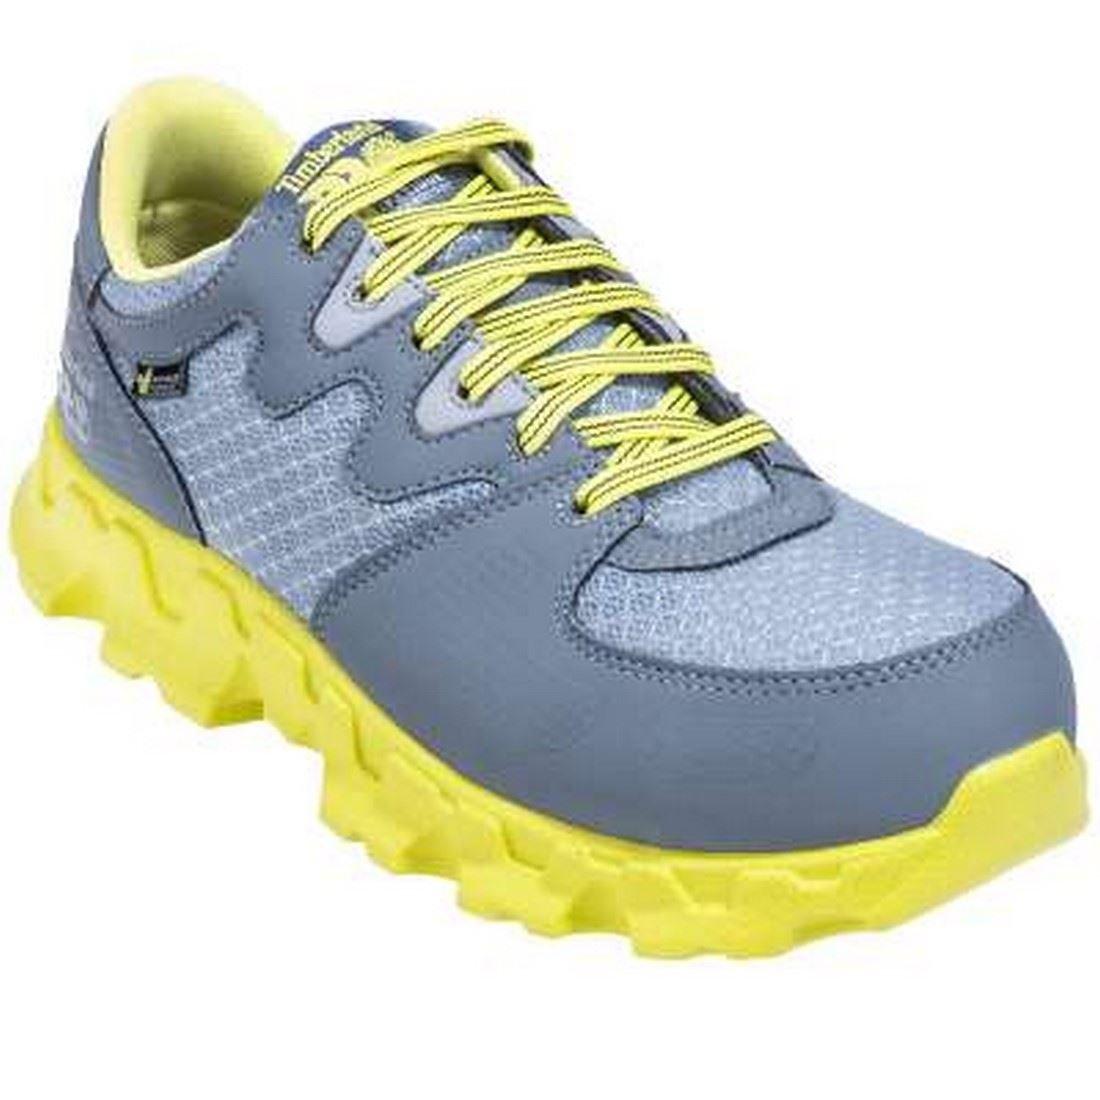 Timberland PRO Women's Powertrain Alloy Toe EH W Industrial Shoe,Grey/High Vis Green Microfiber,6 M US